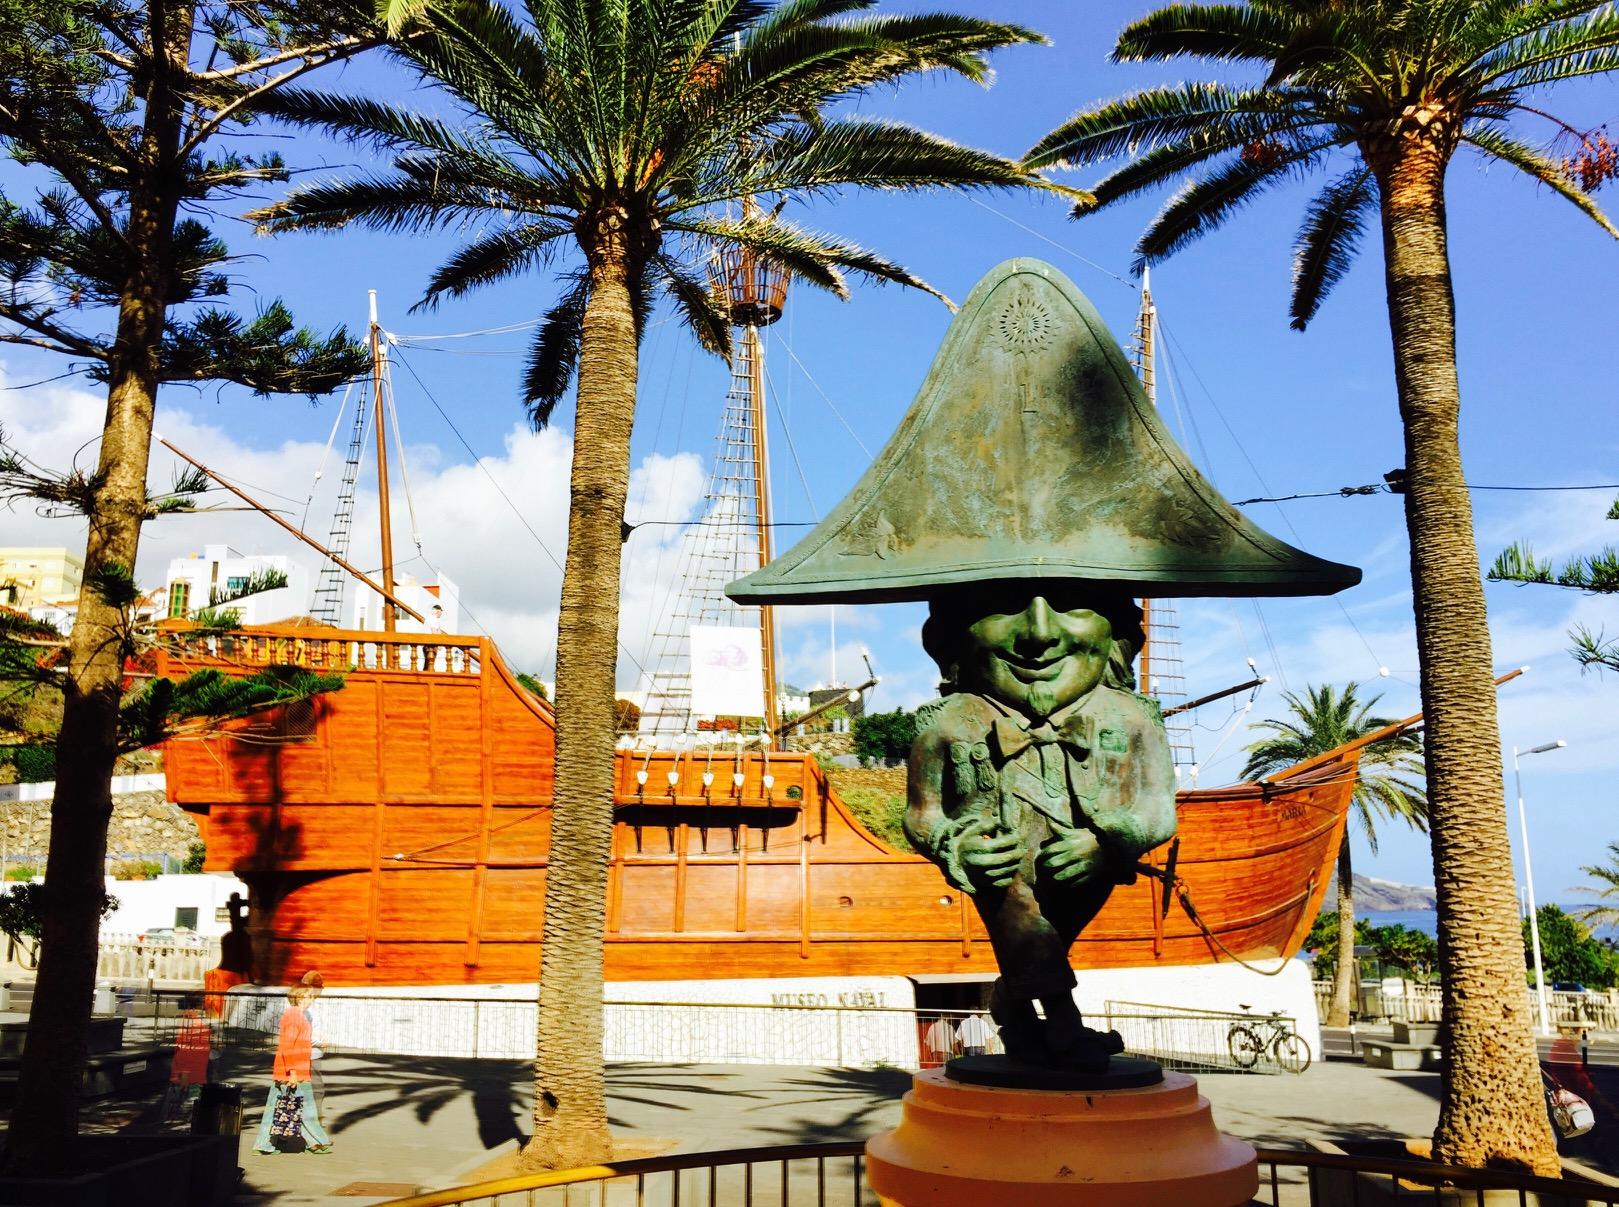 Blick auf die nachgebaute Santa Maria in Santa Cruz de la Palma auf La Palma